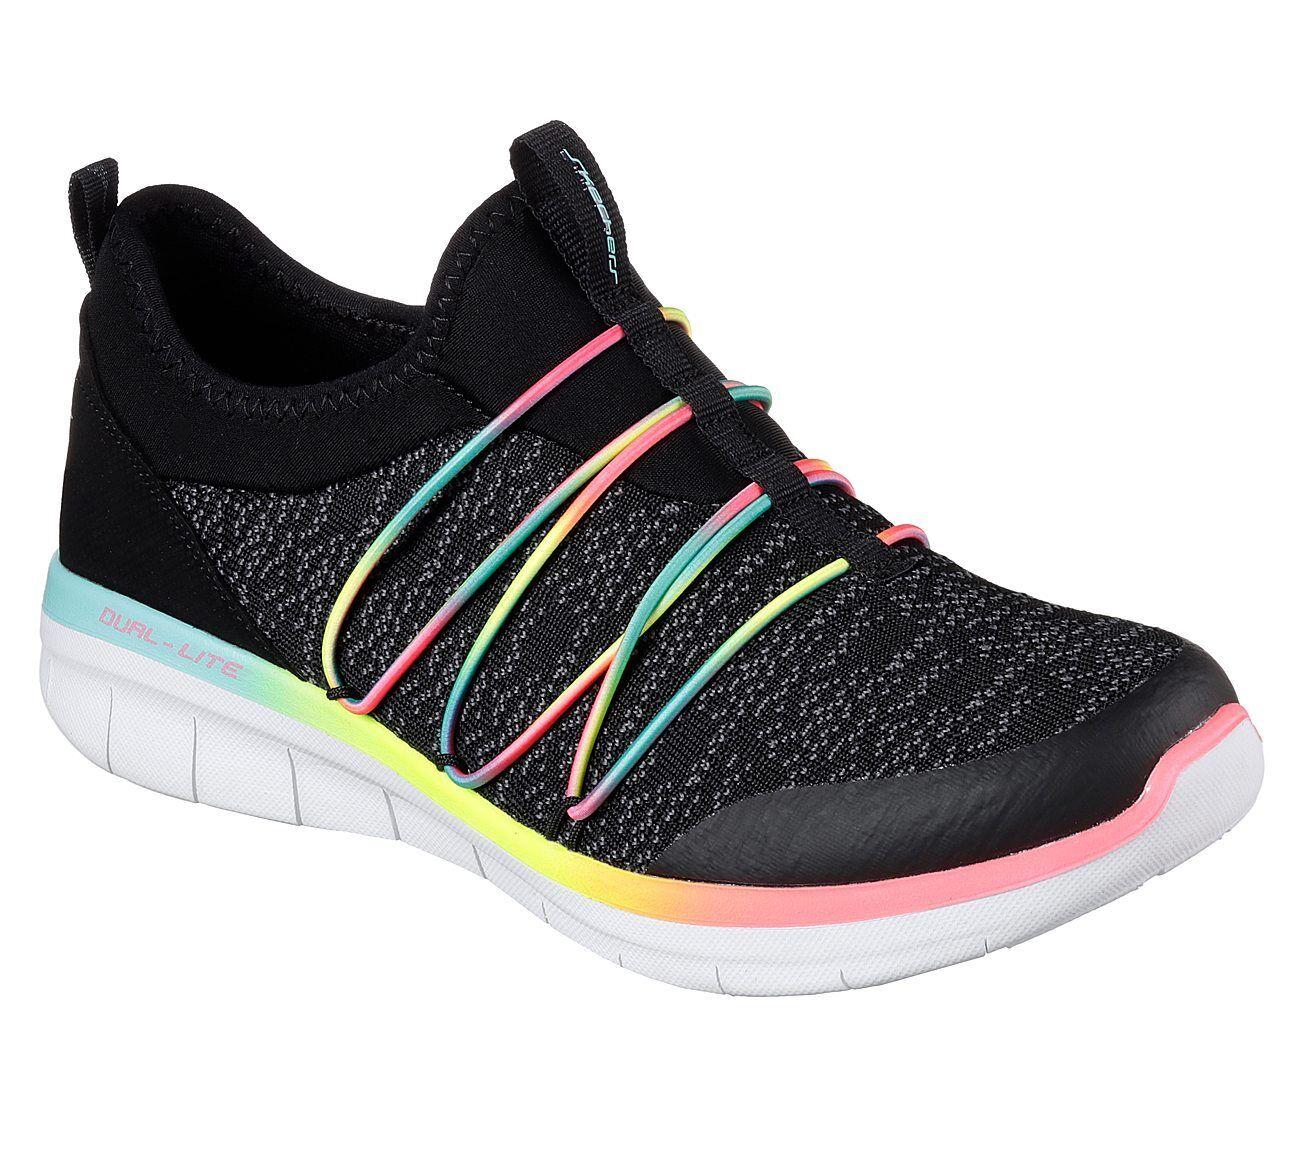 как выглядит Женская спортивная обувь 12379 W Wide Fit Black Skechers shoe Memory Foam Women Sport Slip On Comfort New фото